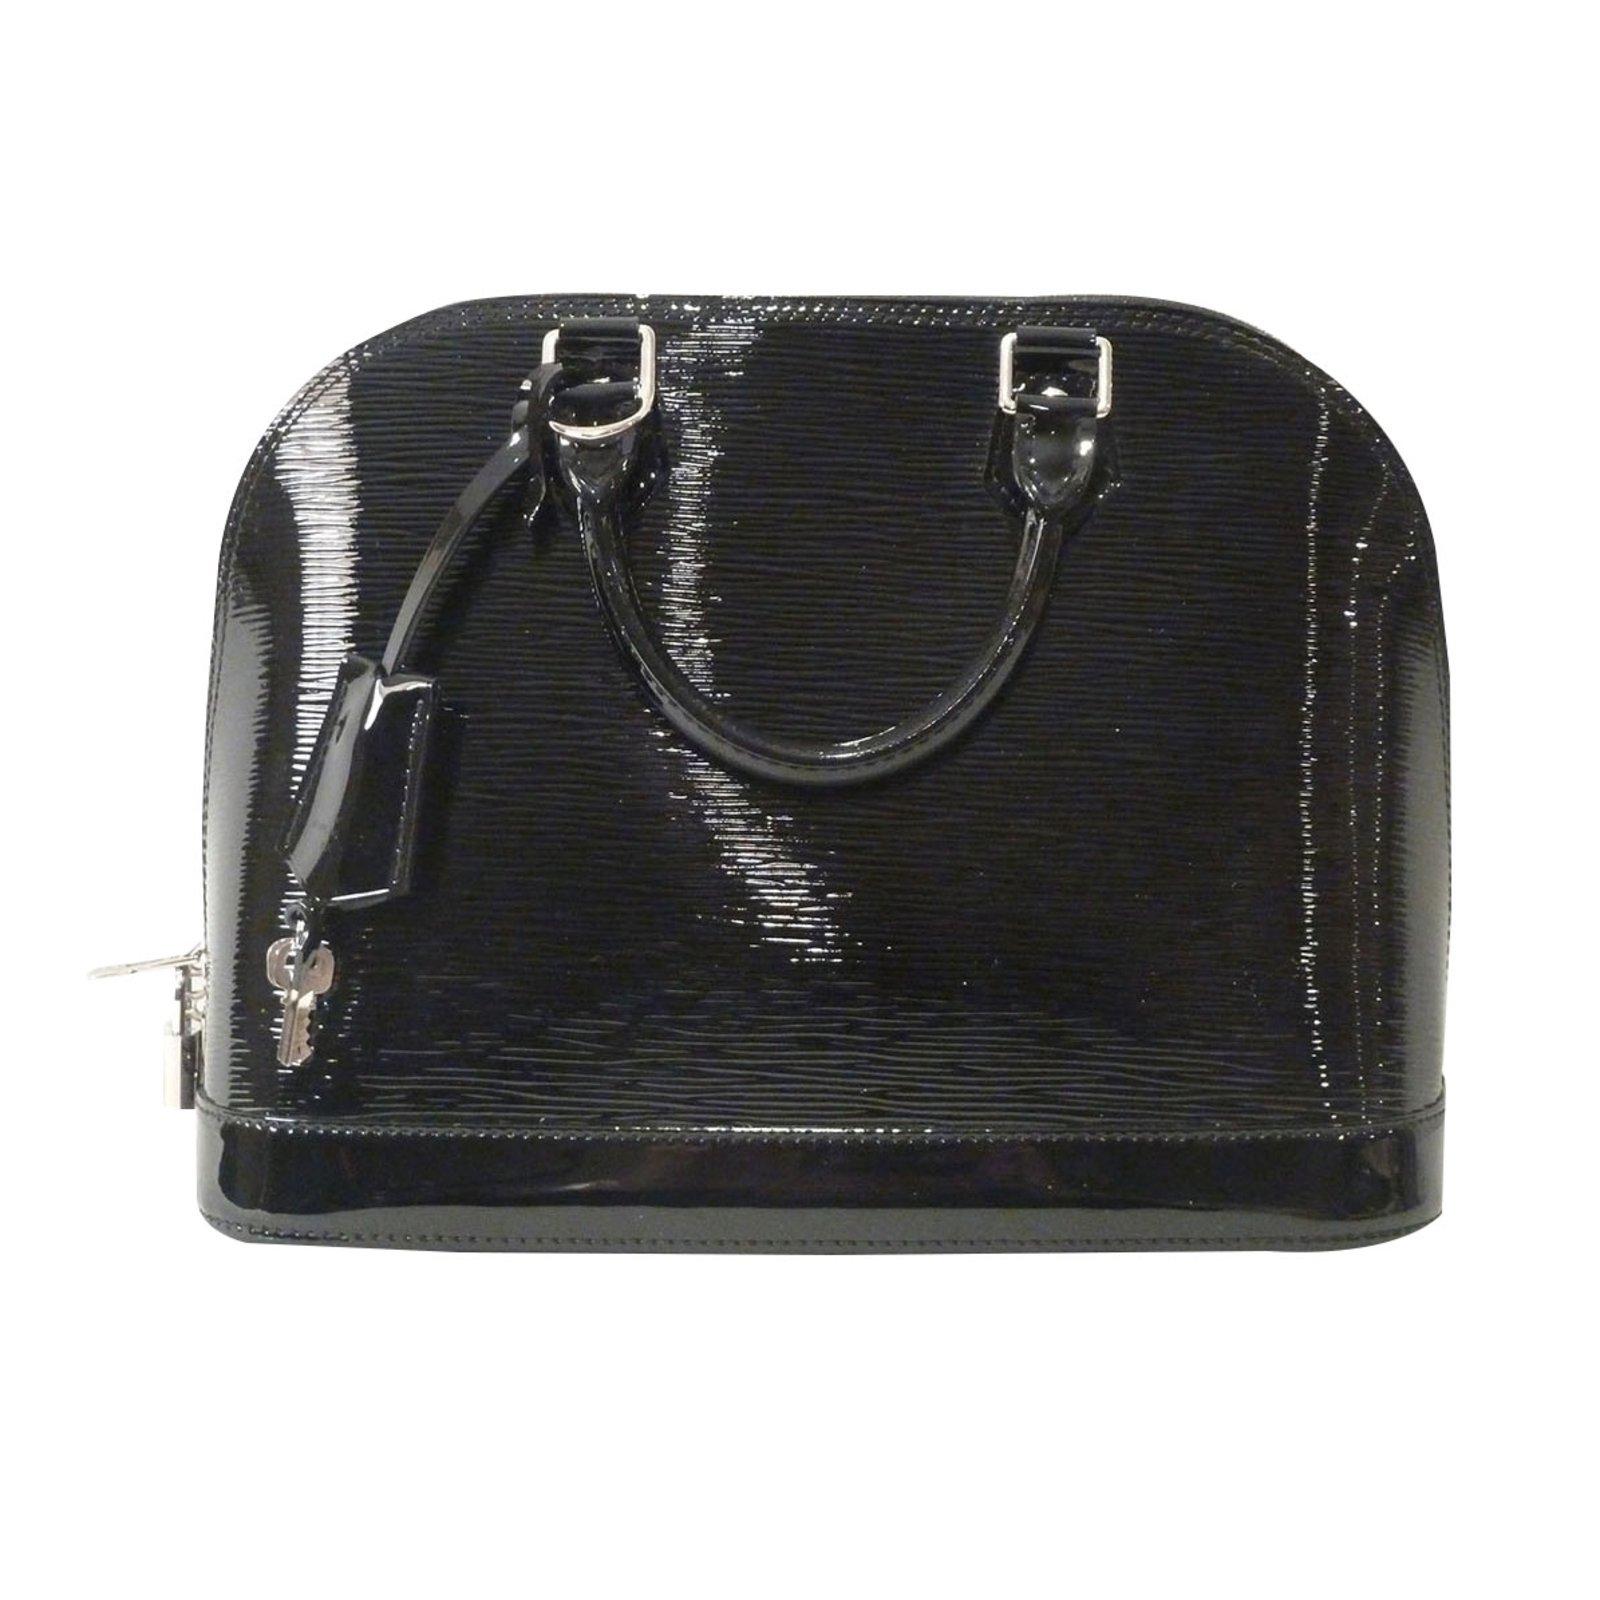 Louis Vuitton Alma PM Tote Bag Totes Patent leather Black ref.87989 ... dabe772428d1e